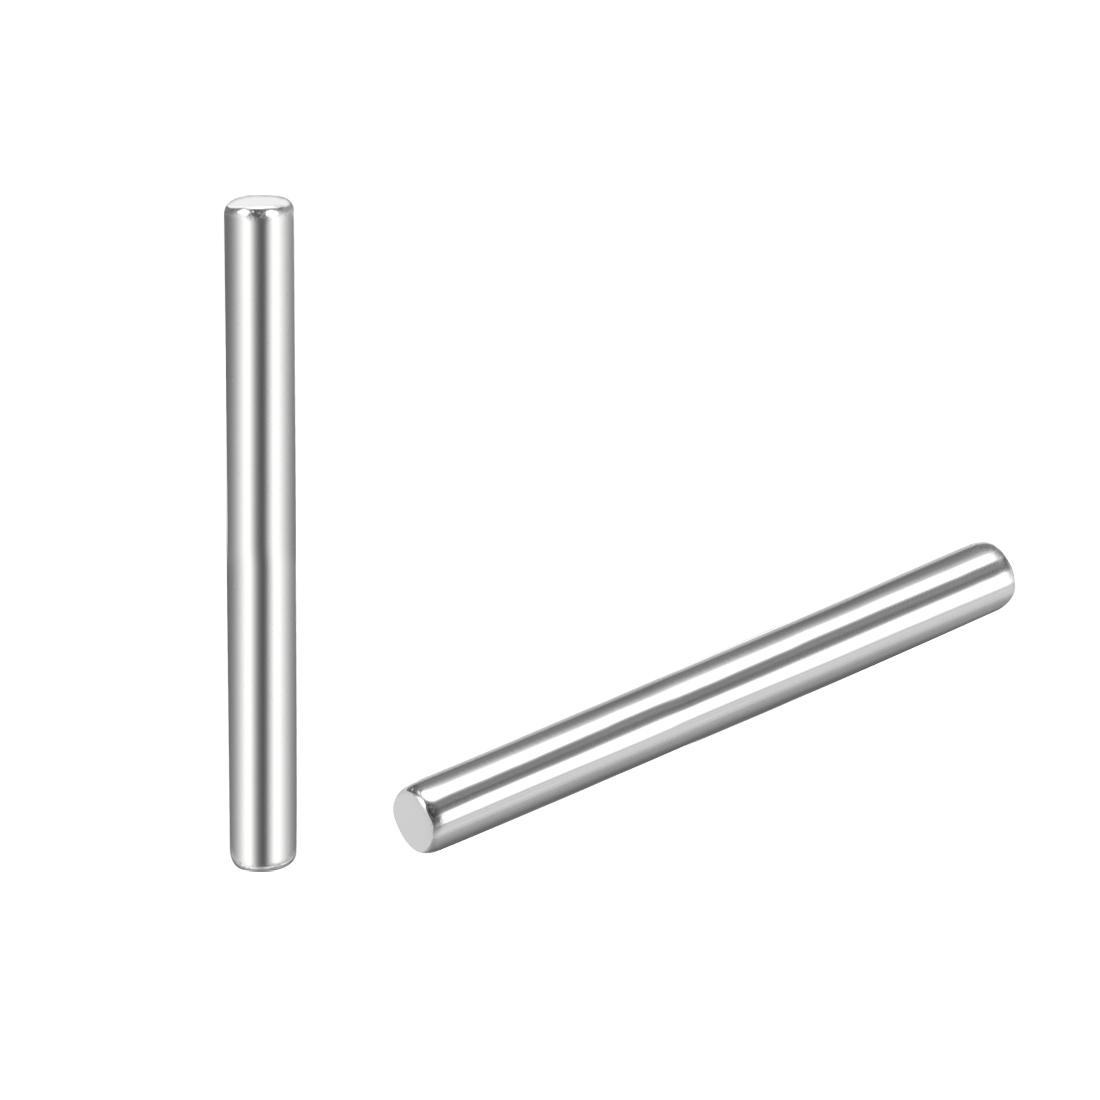 25Pcs 1.5mm x 20mm Dowel Pin 304 Stainless Steel Shelf Support Pin Fasten